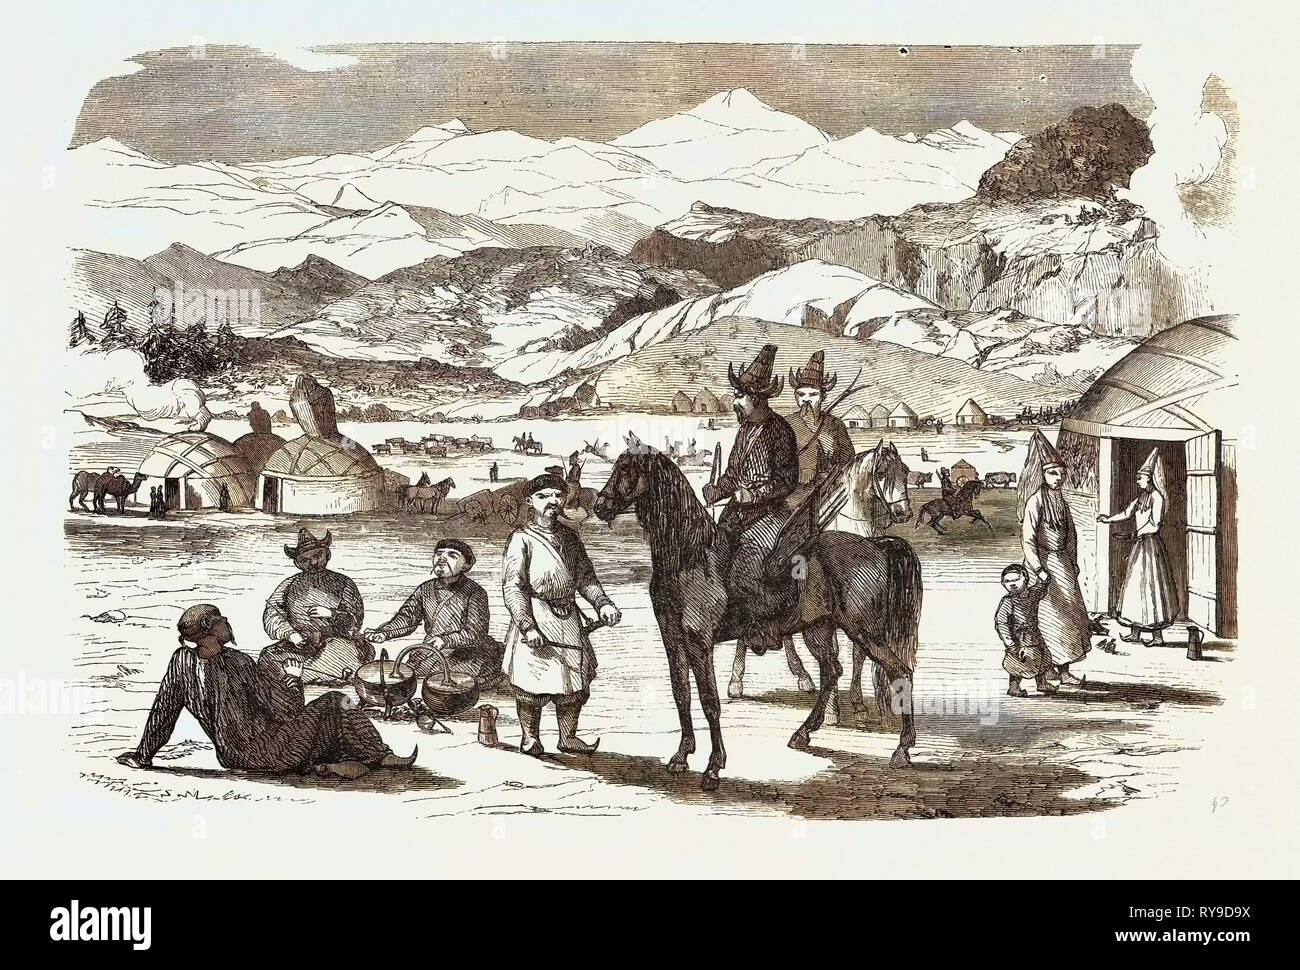 Winemaking in Kirghiz, Kyrgyz, Kyrgystan. Engraving 1855 - Stock Image